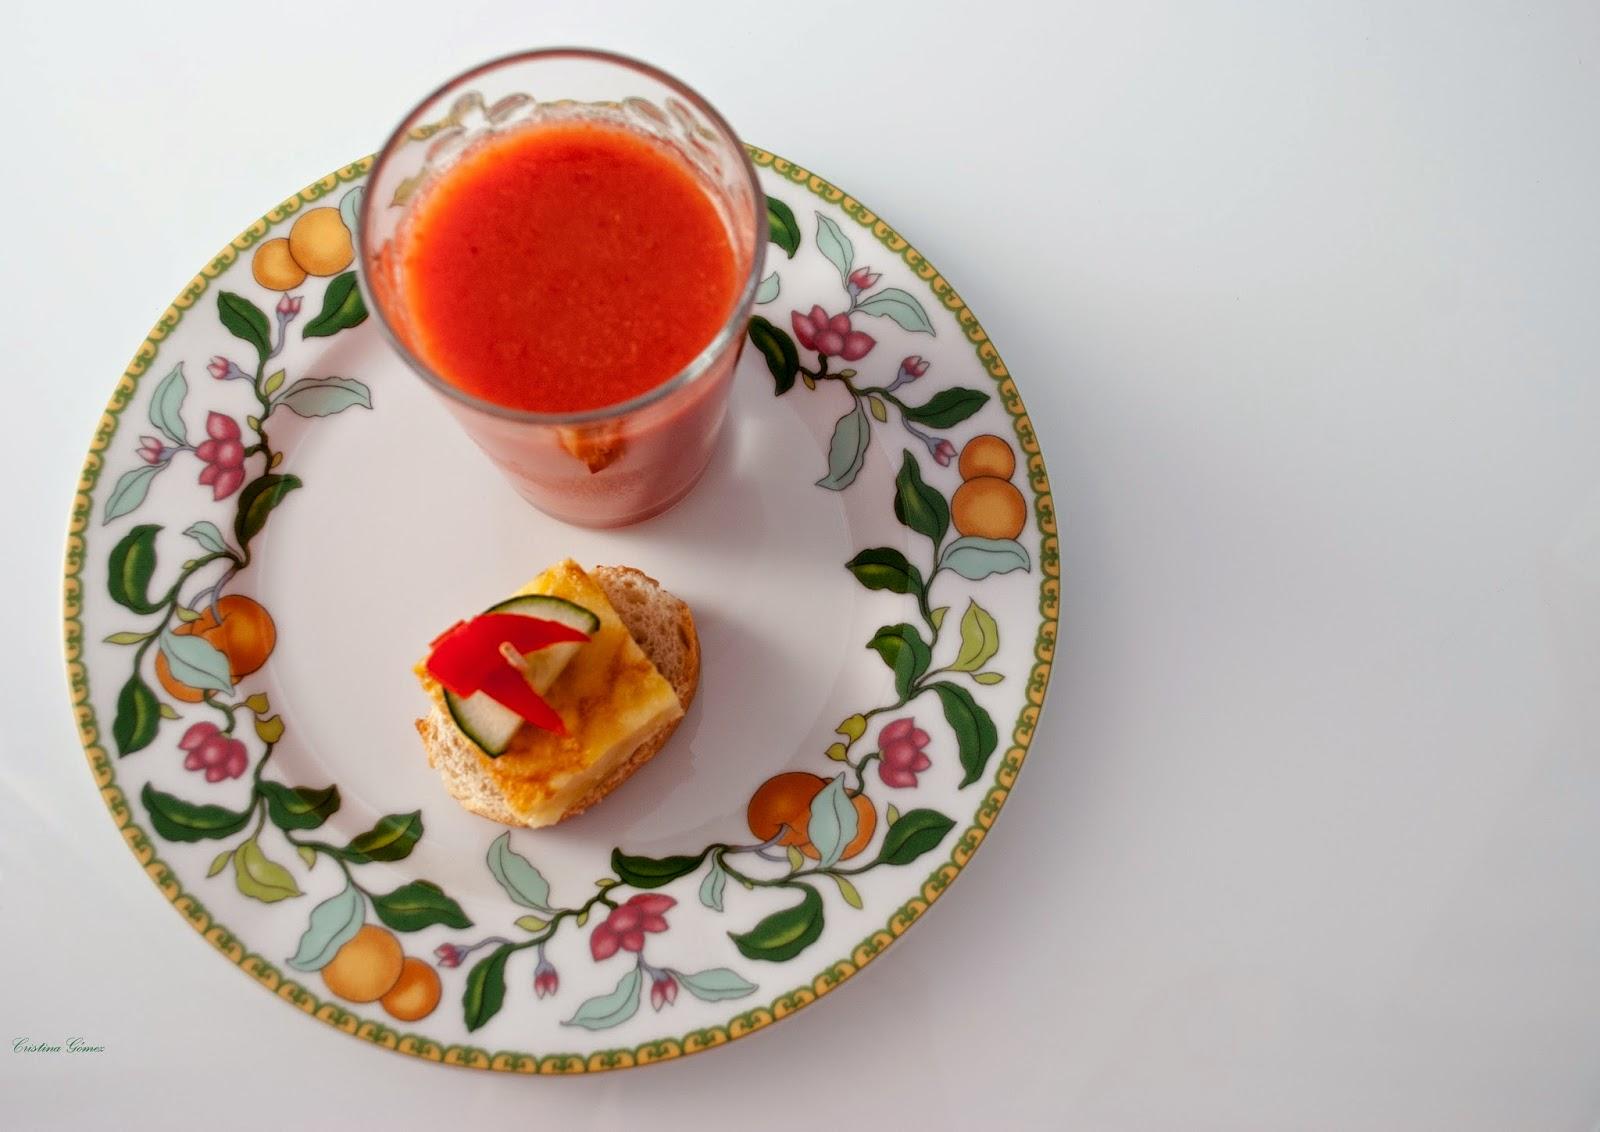 Mondays We Cook: Gazpacho & Tortilla de Patata